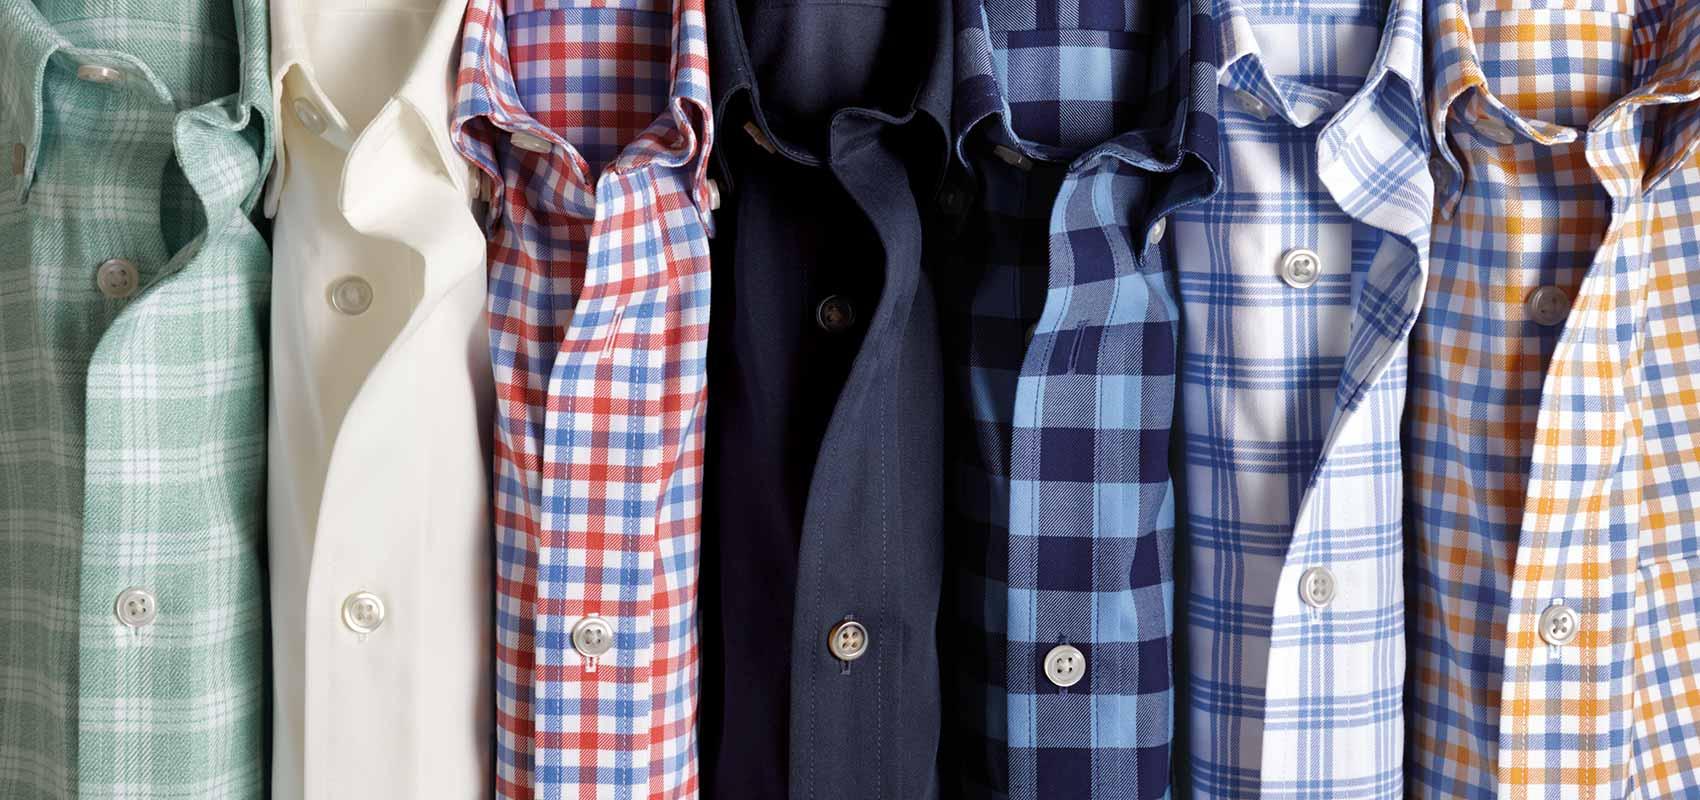 Charles Tyrwhitt  non-iron casual shirts